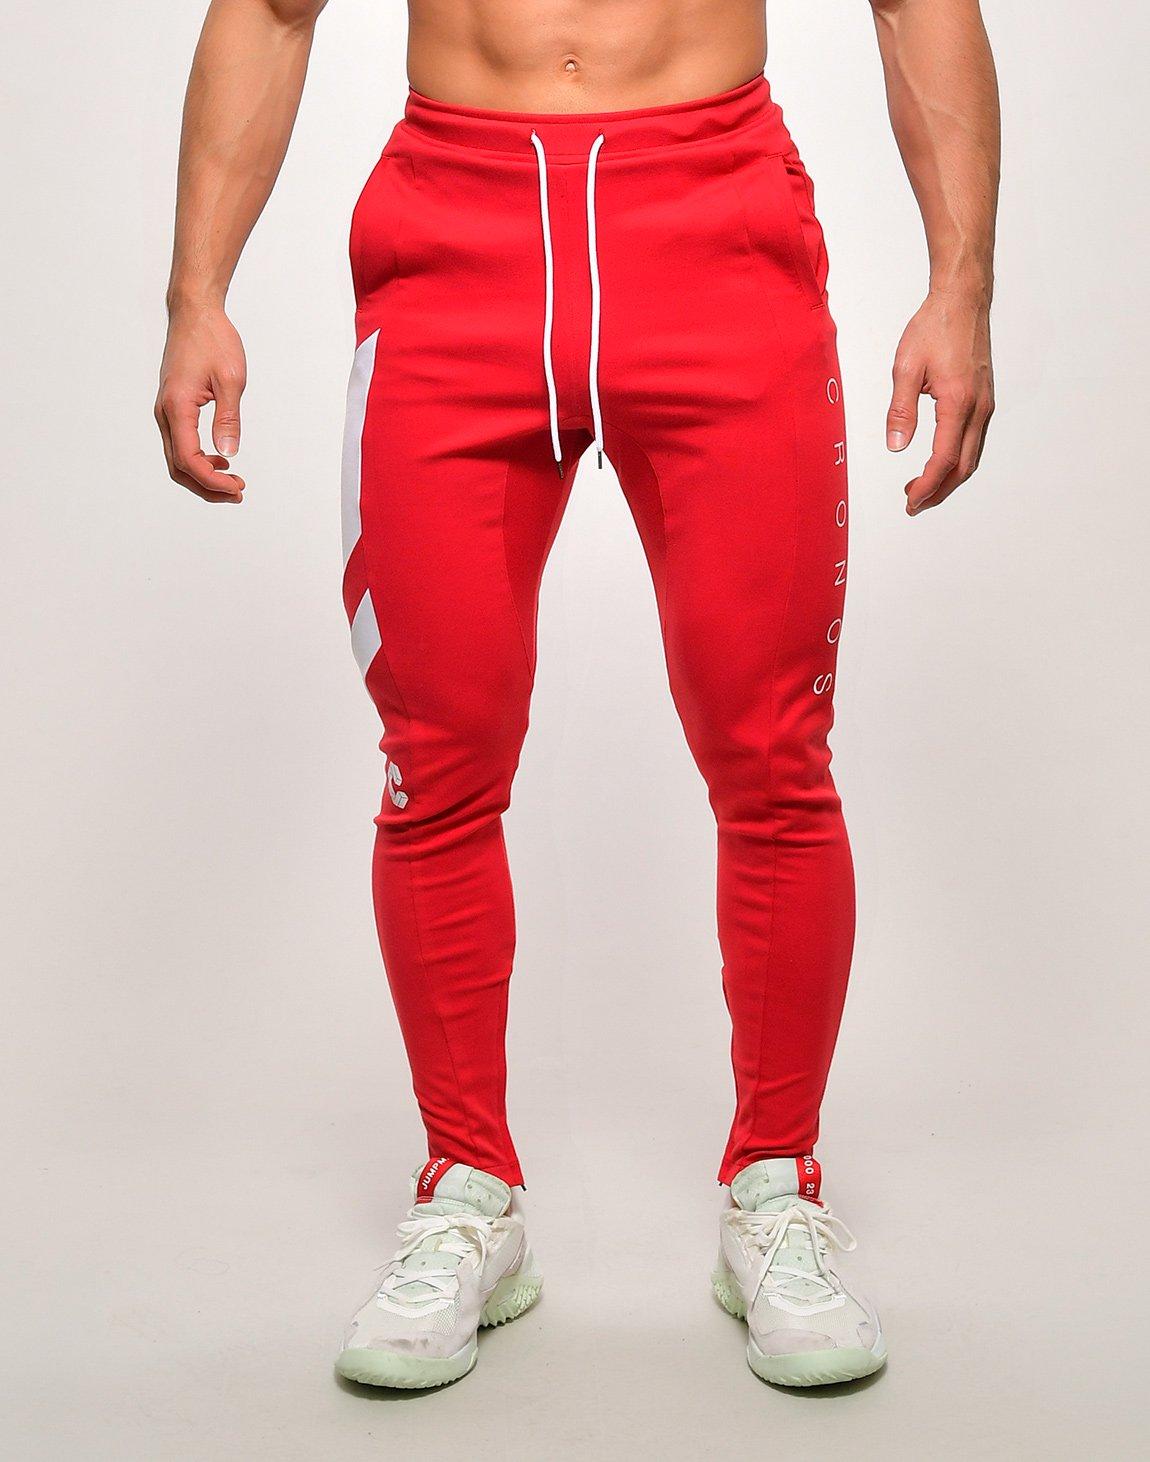 CRONOS SLANTED LINE PANTS【RED】